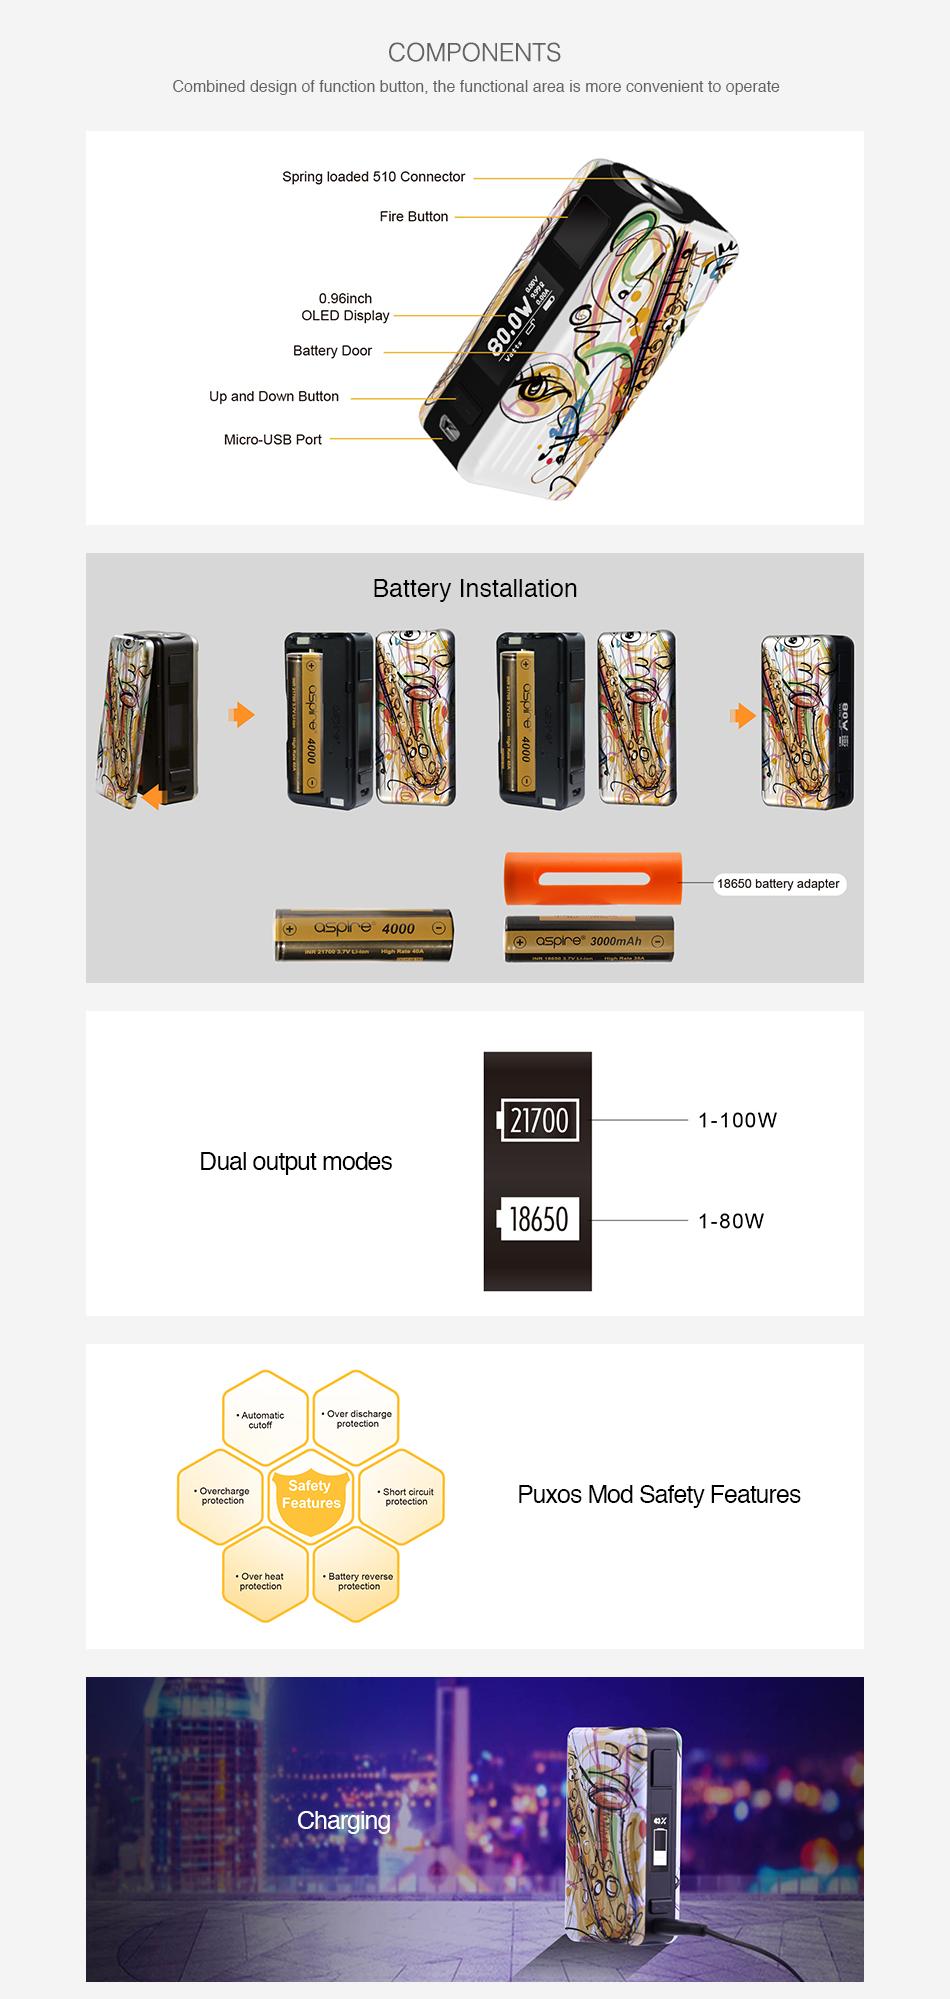 Aspire-Puxos-80_100W-TC-Box-MOD_06_517c73